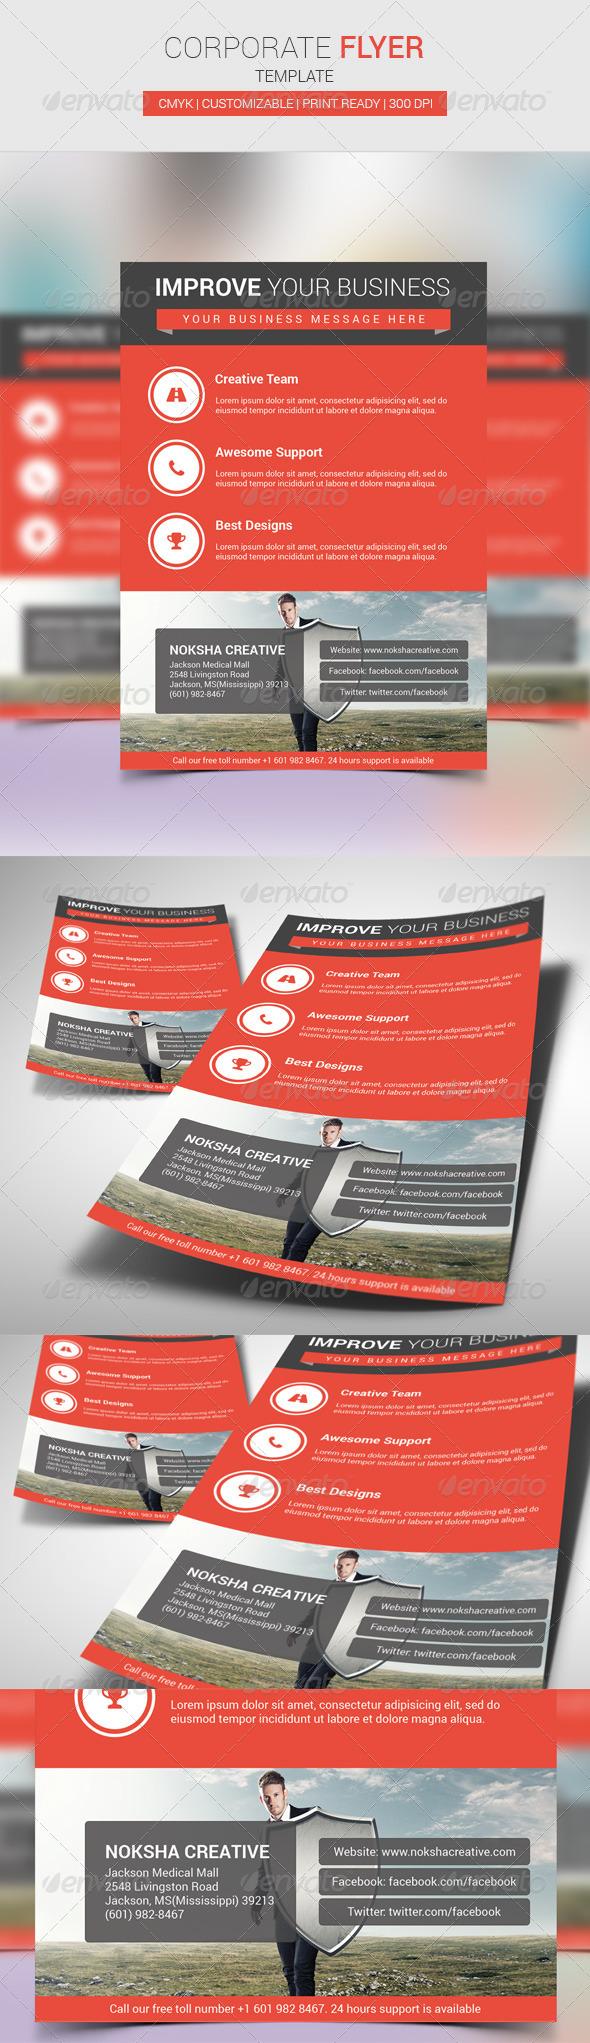 GraphicRiver Corporate Flyer 6958080